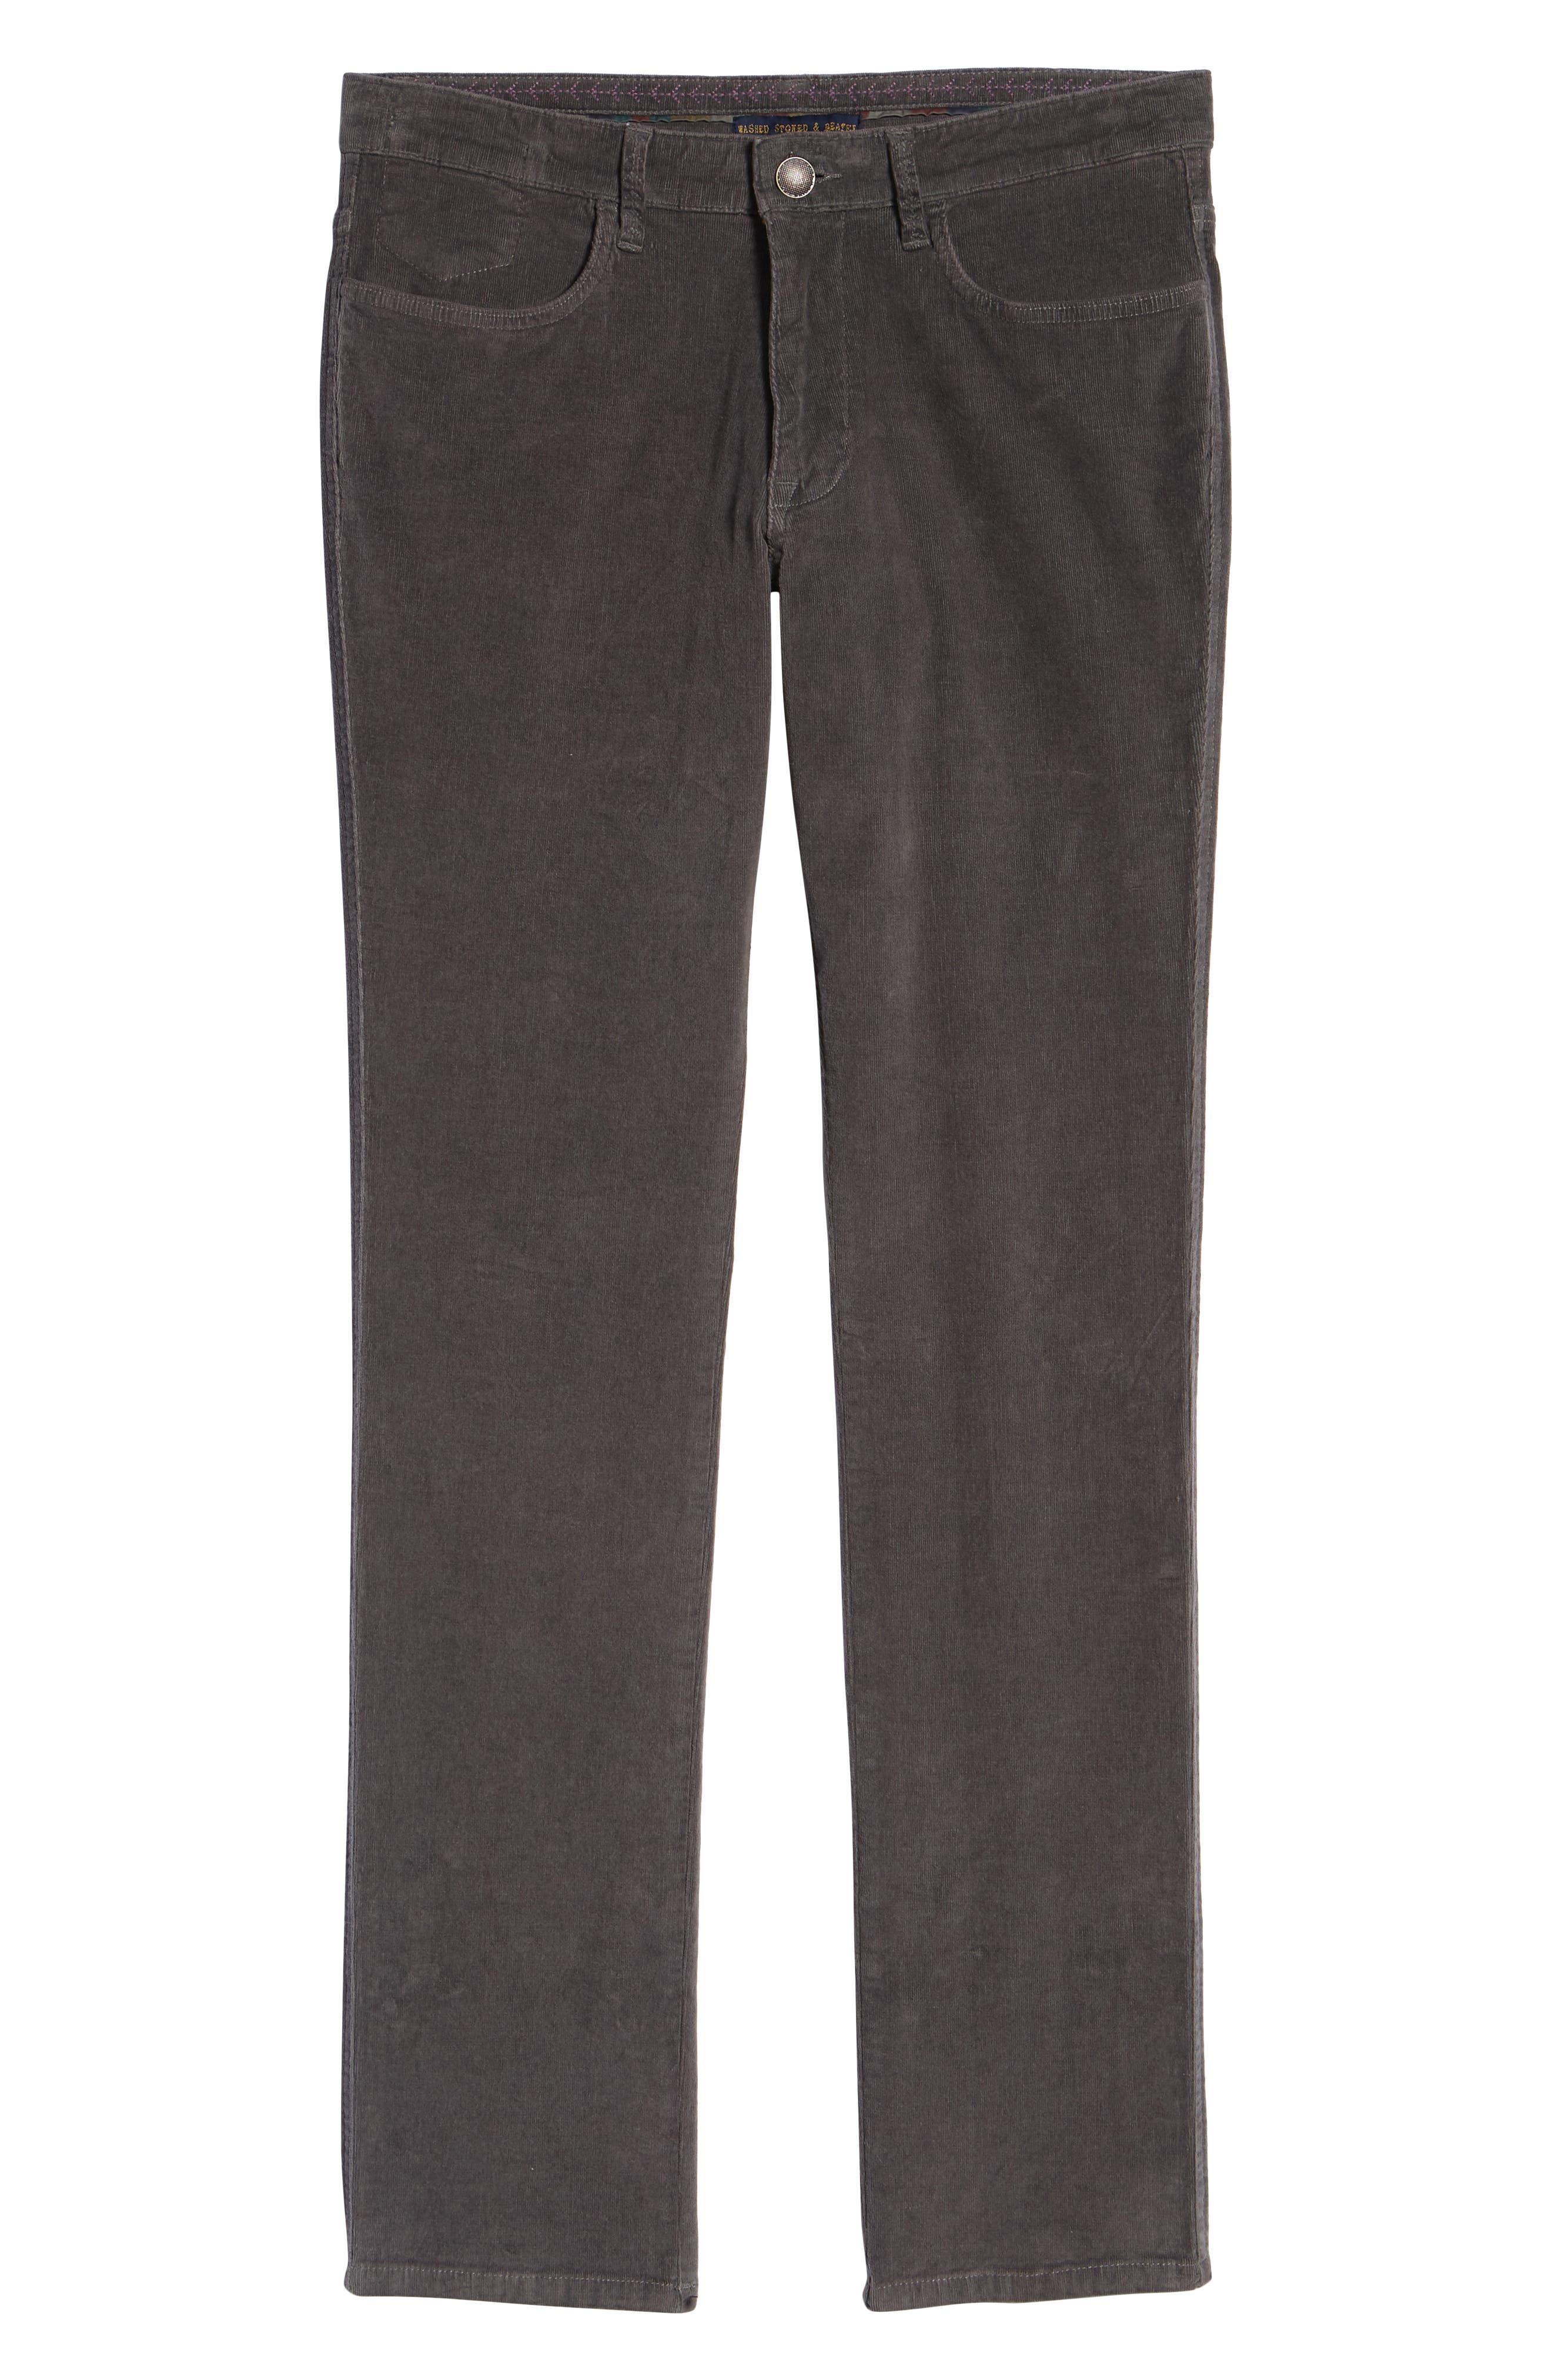 VINTAGE 1946,                             Modern Fit Stretch Corduroy Pants,                             Alternate thumbnail 6, color,                             CHARCOAL